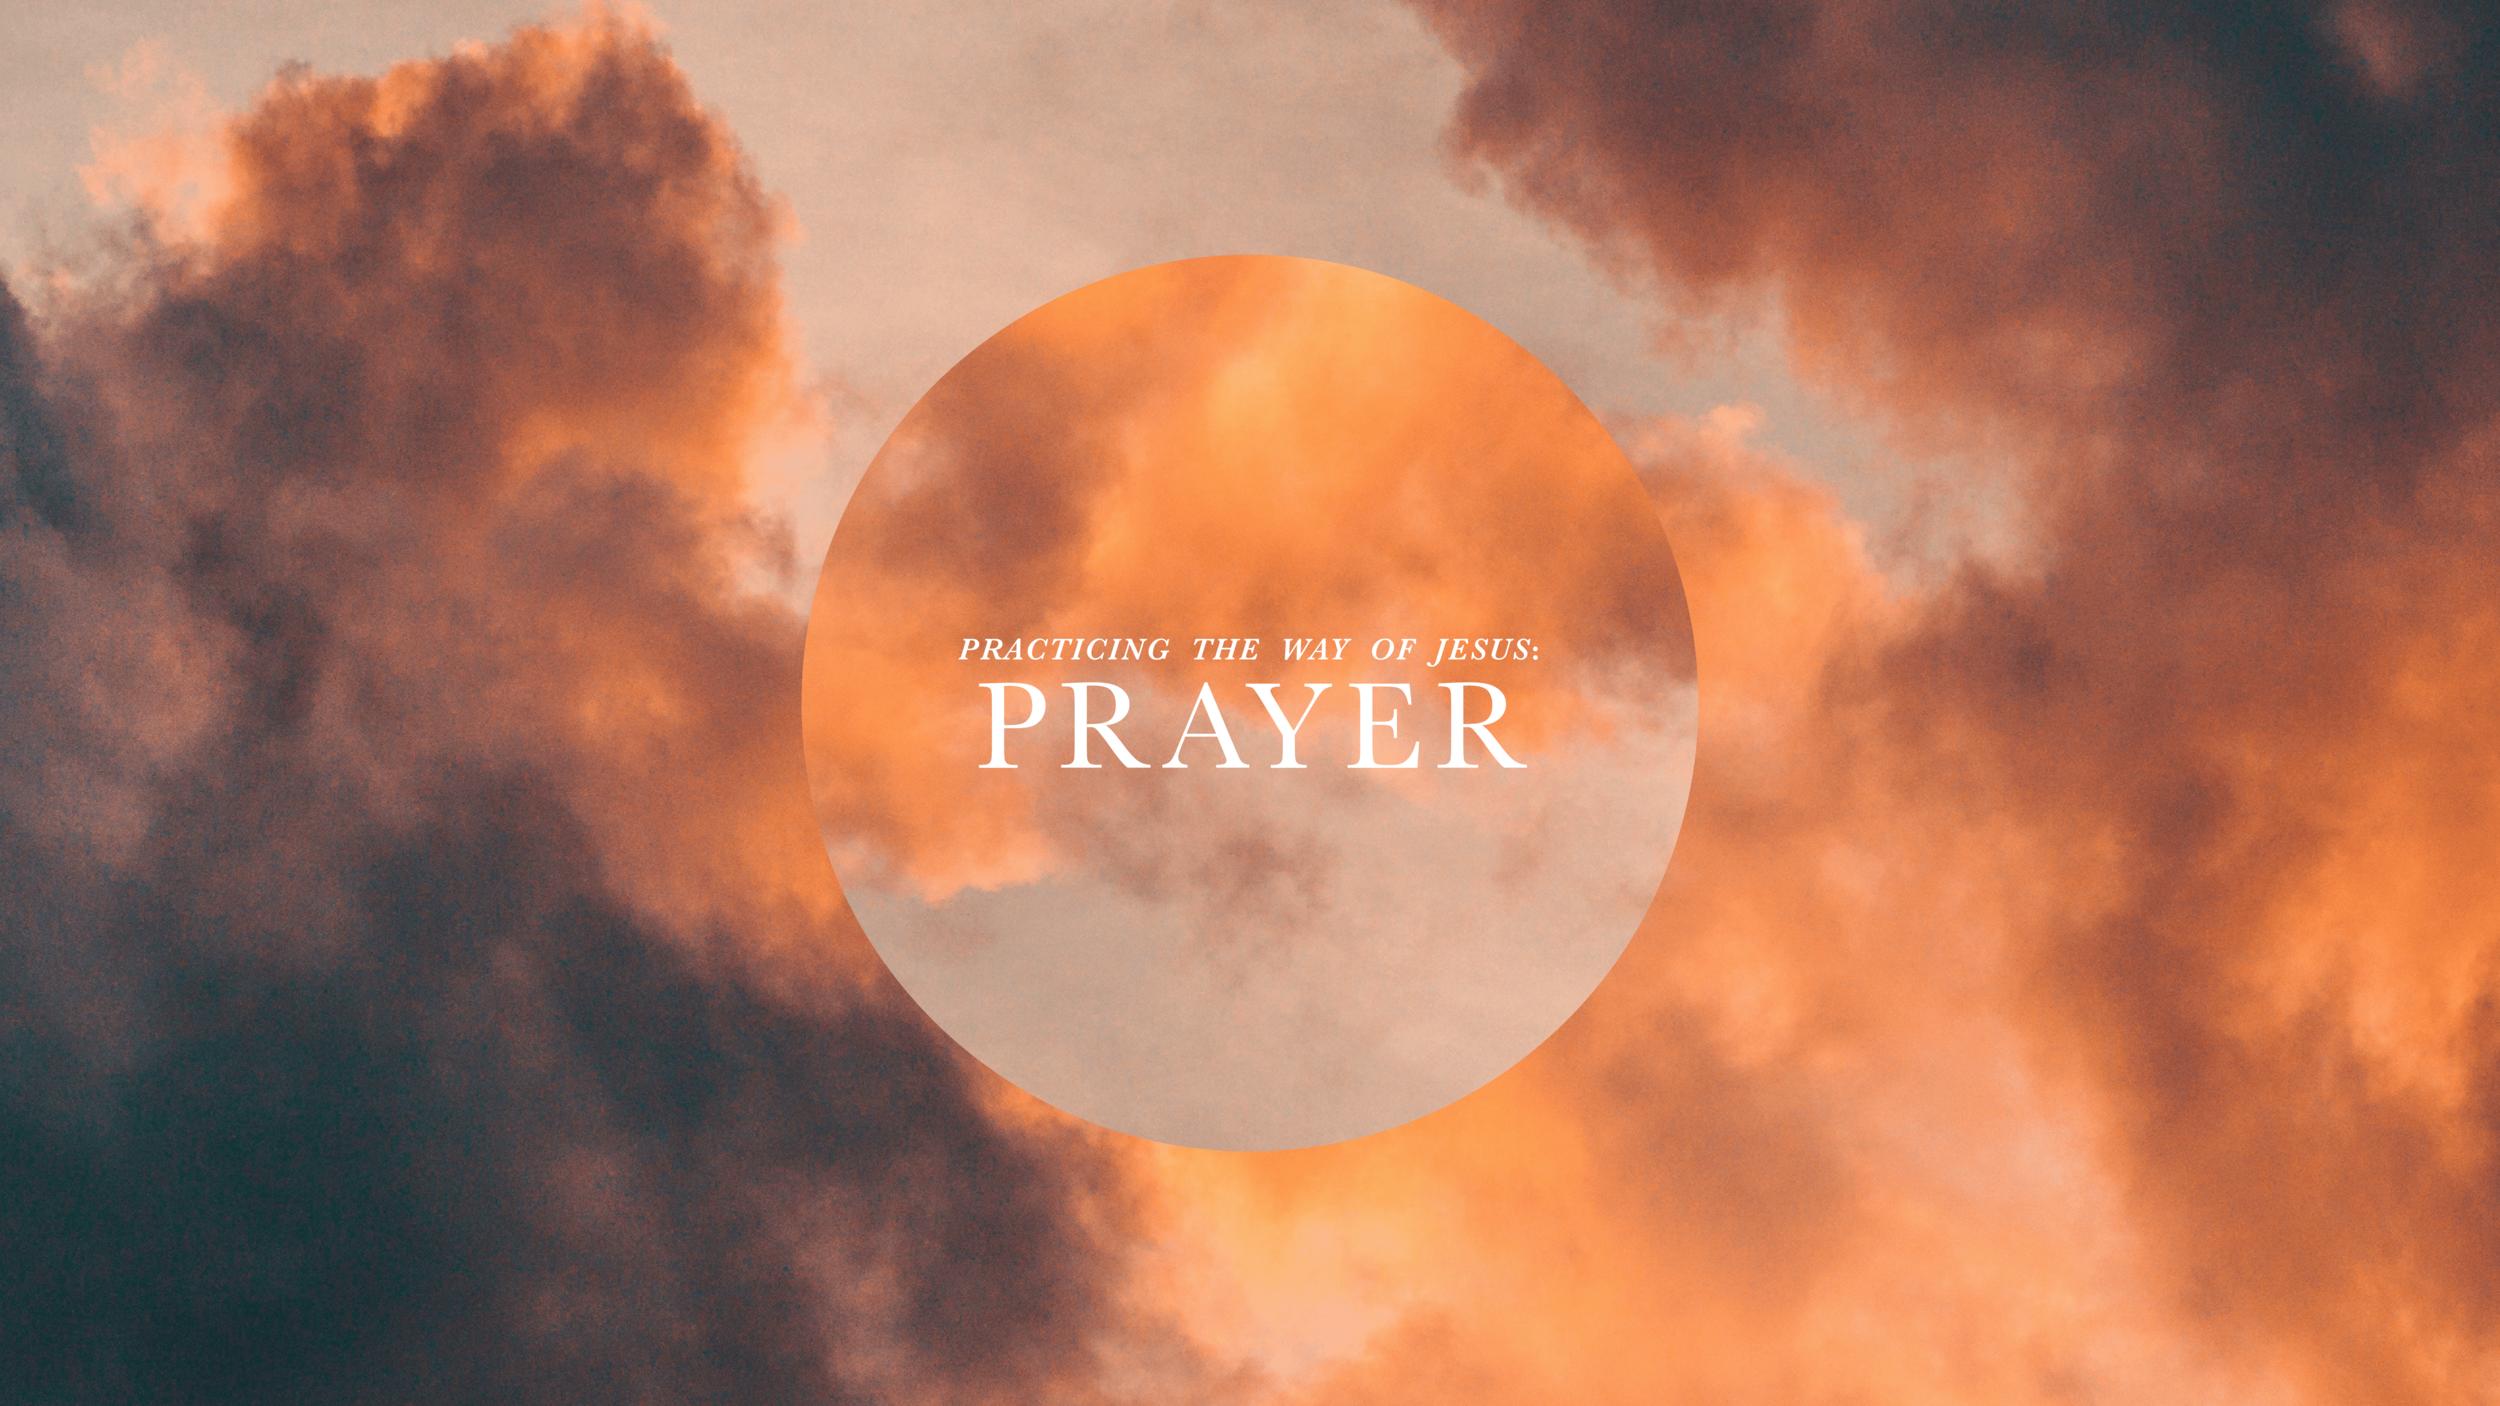 PTWOJ-Prayer.png